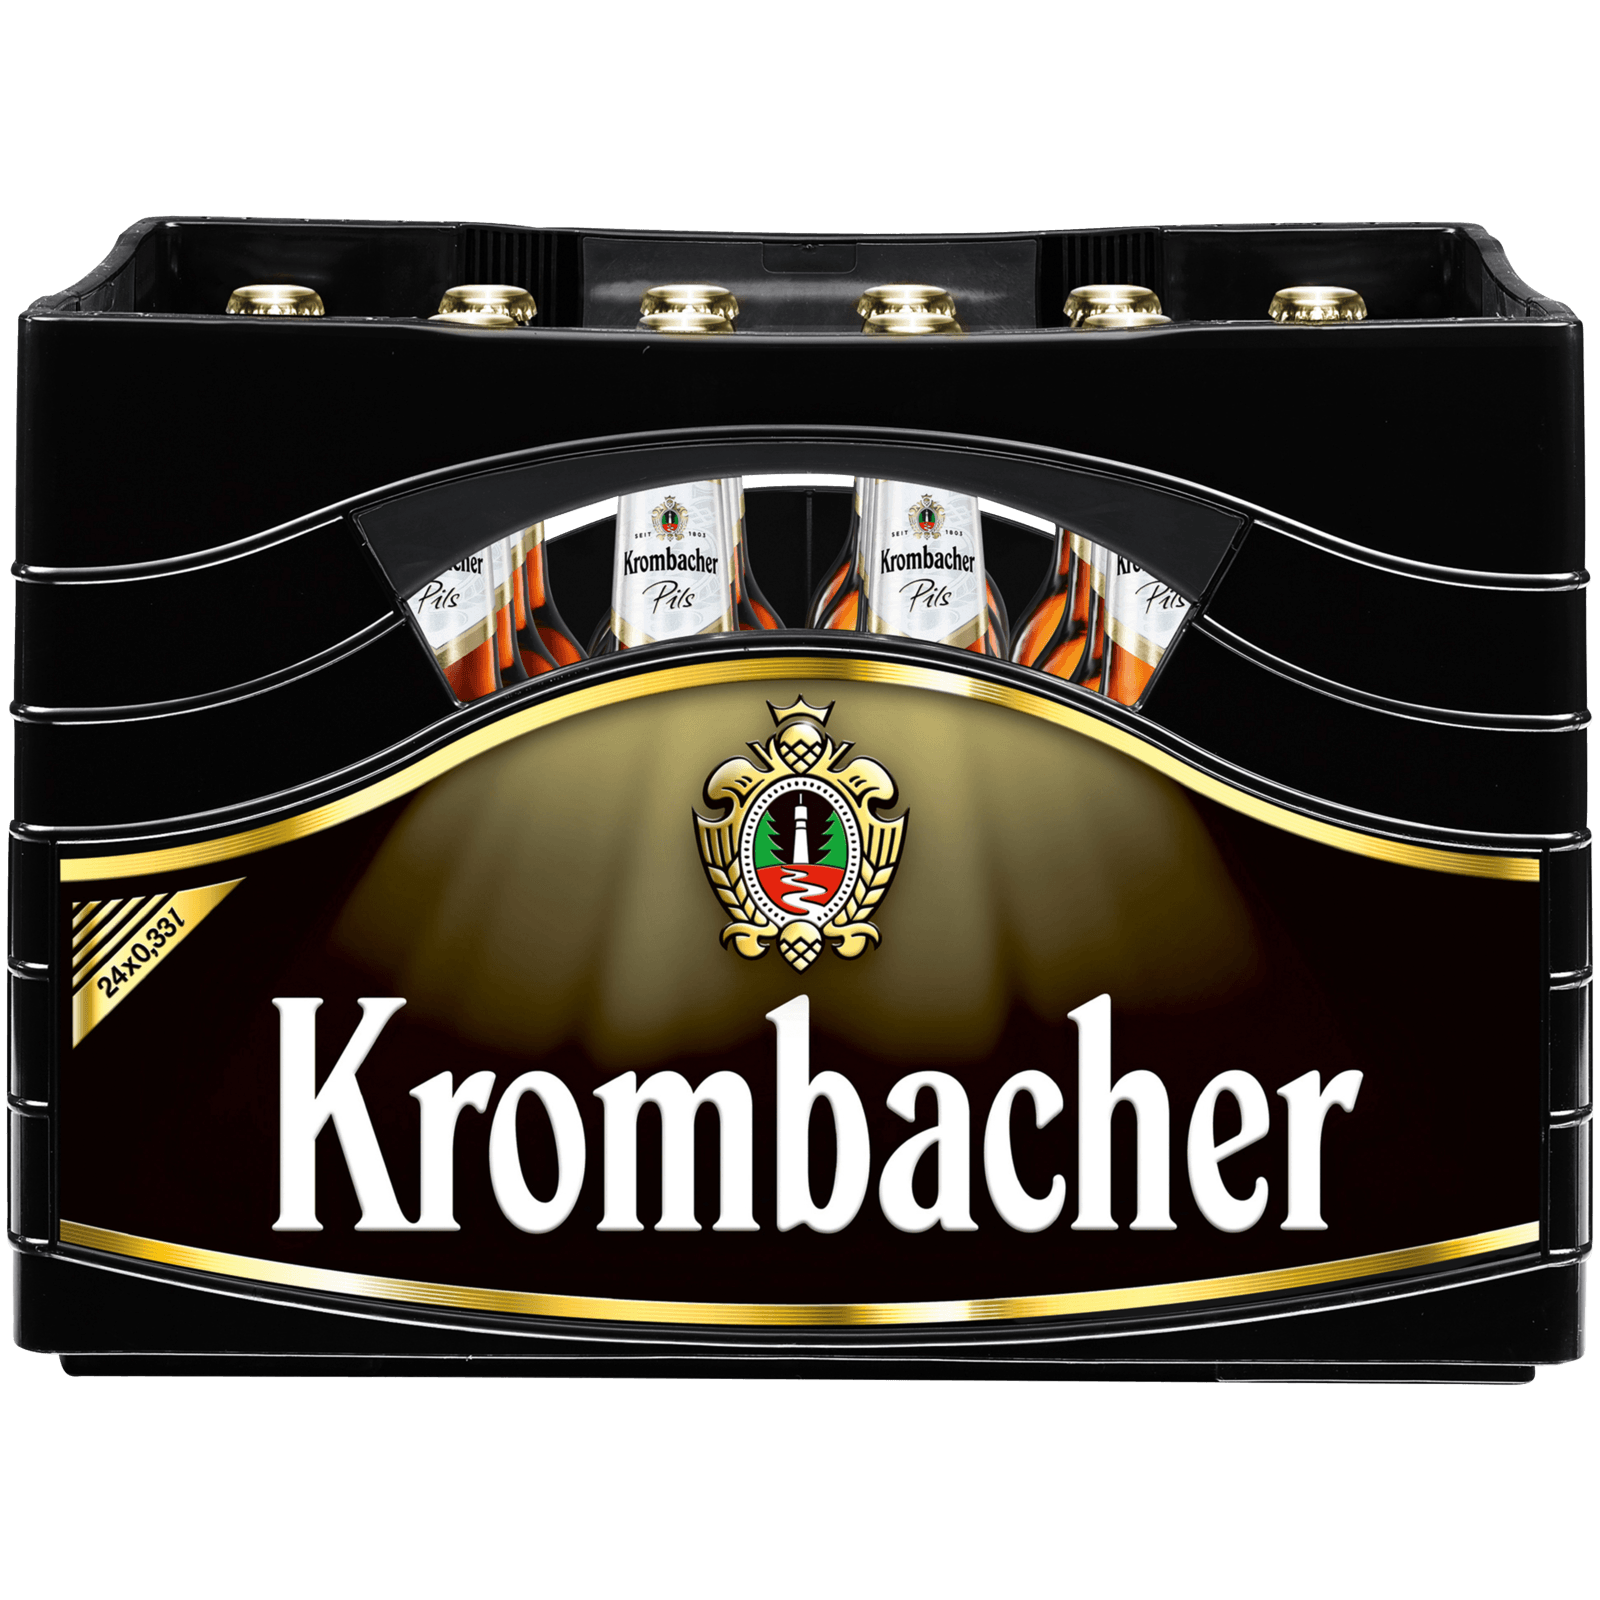 Krombacher Pils 24x033l Bei Rewe Online Bestellen